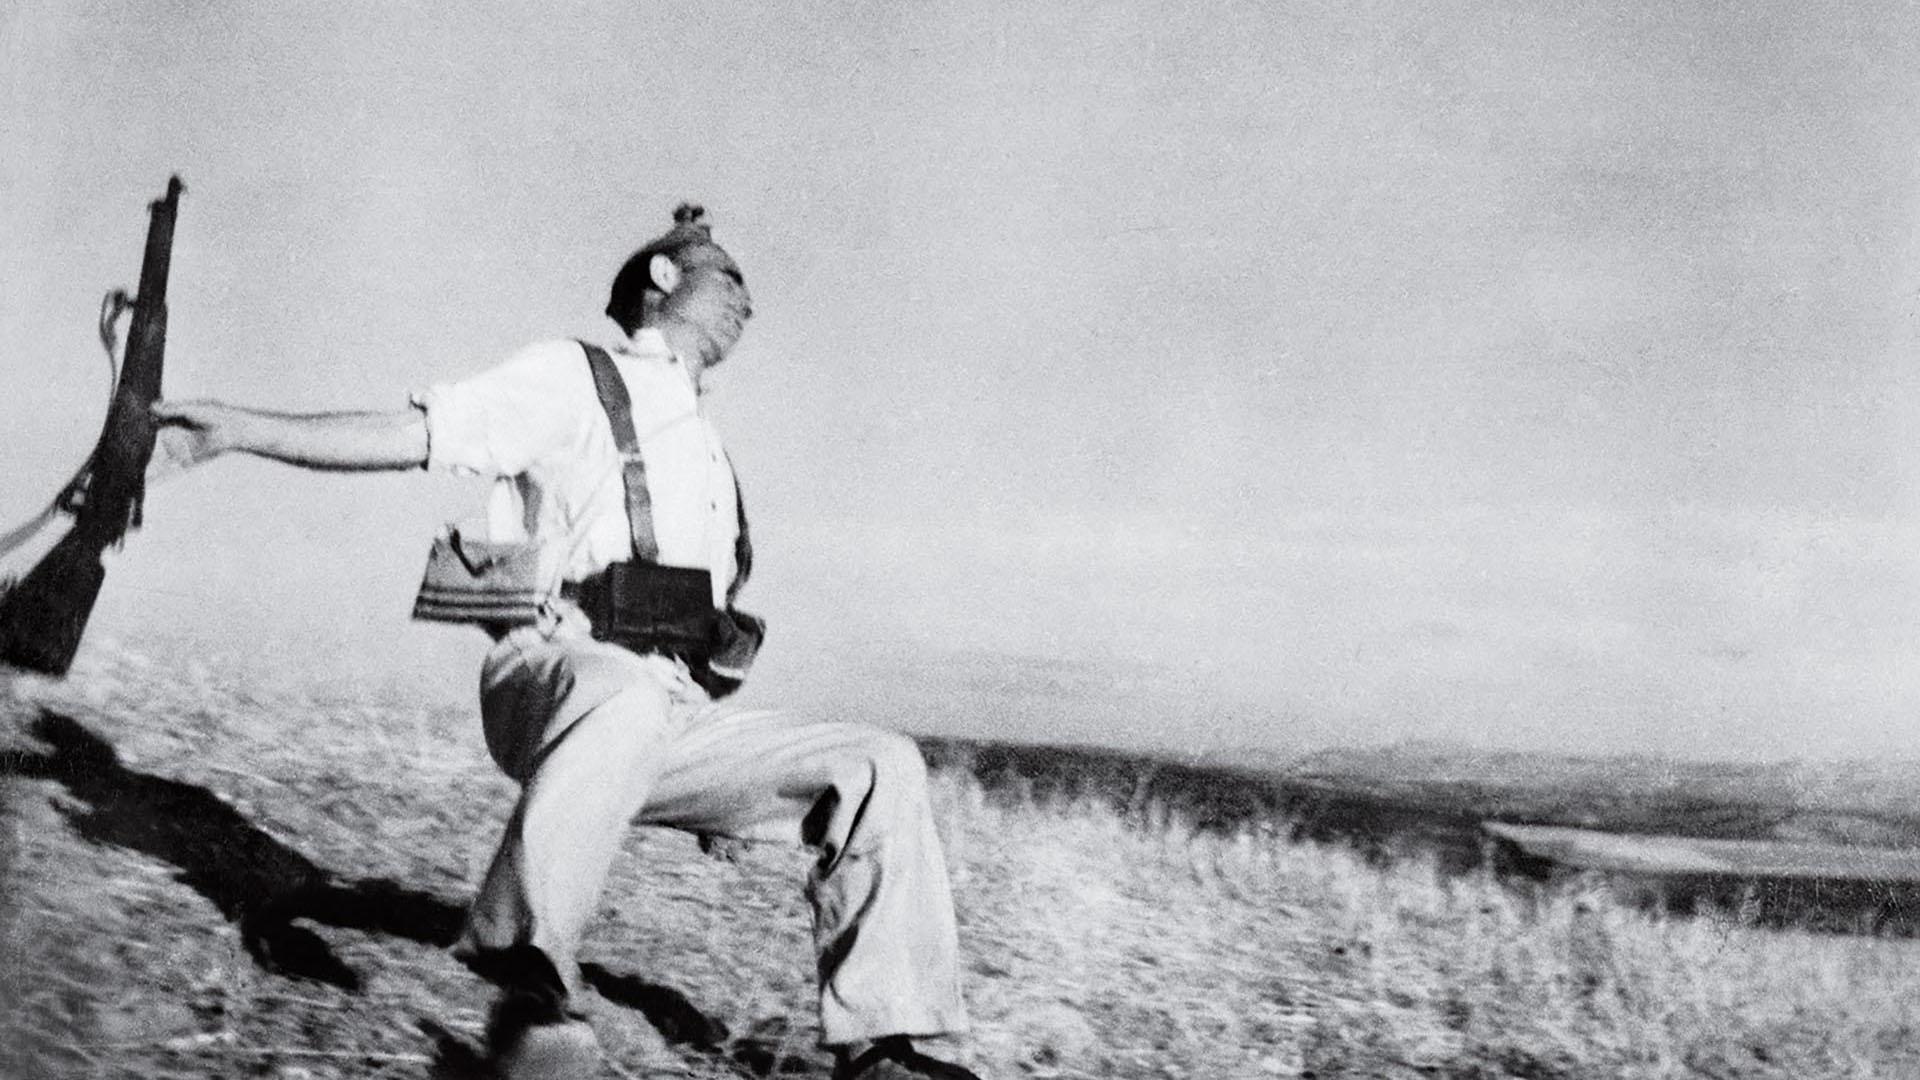 Fotógrafos Time-100-influential-photos-robert-capa-falling-soldier-24-PORTADA